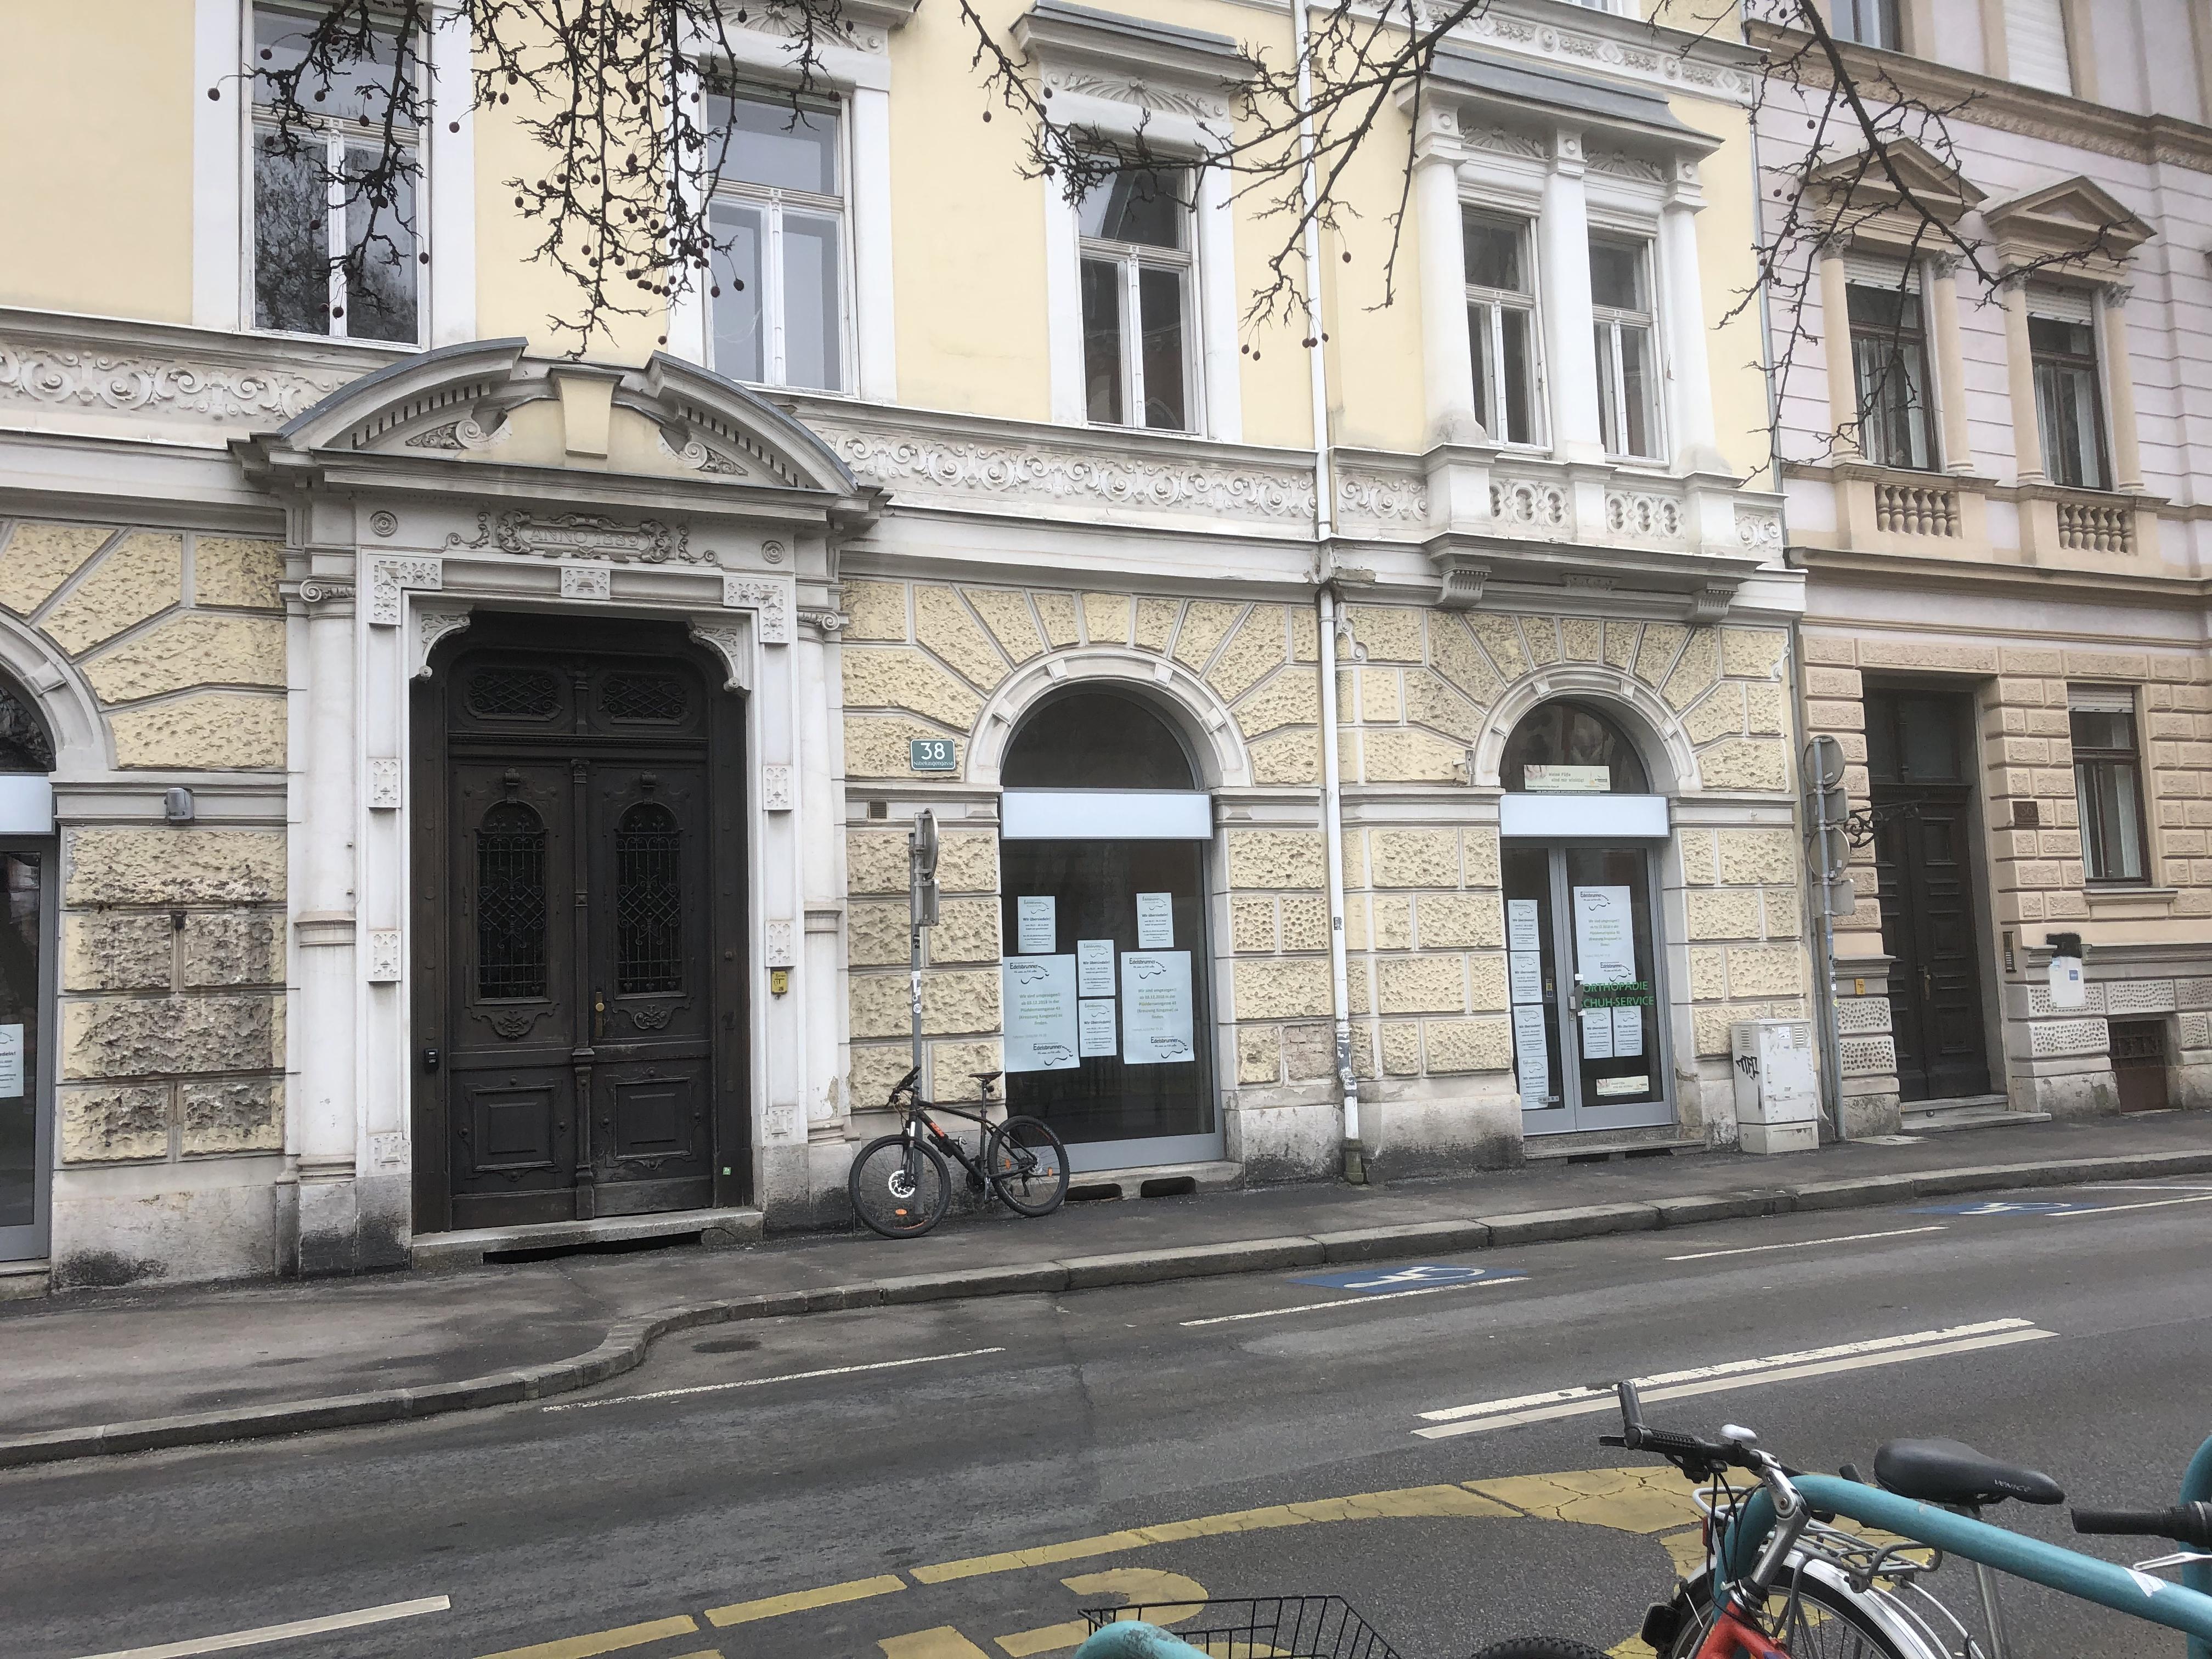 Geschäftslokal oder Büro in der Nibelungengasse